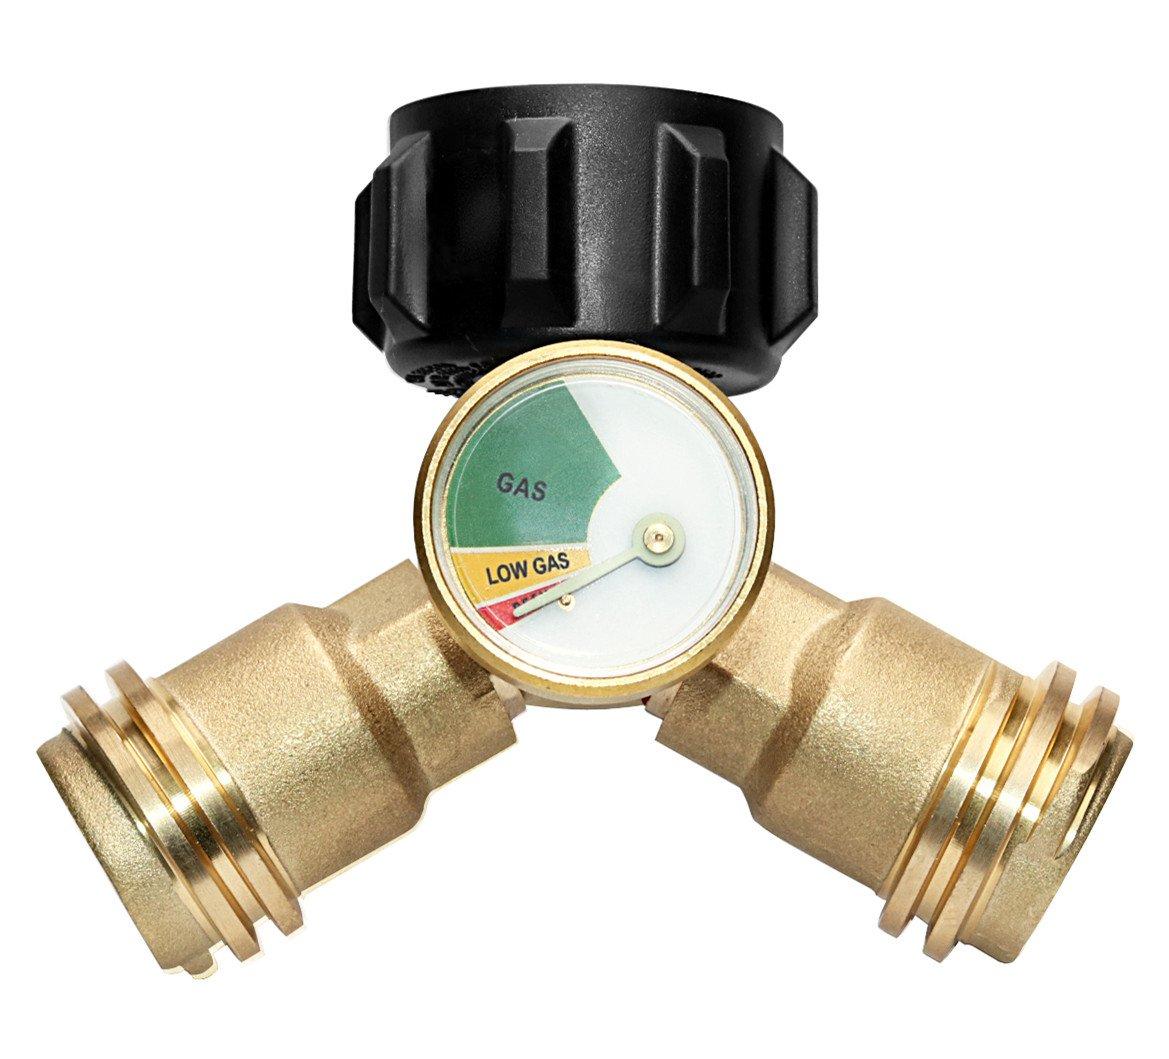 DOZYANT Propane Y-Splitter Tee Adapter Connector Propane Tank Gauge Level Indicator Leak Detector Gas Pressure Meter, 100% Solid Brass 1 Female QCC 2 Male QCC